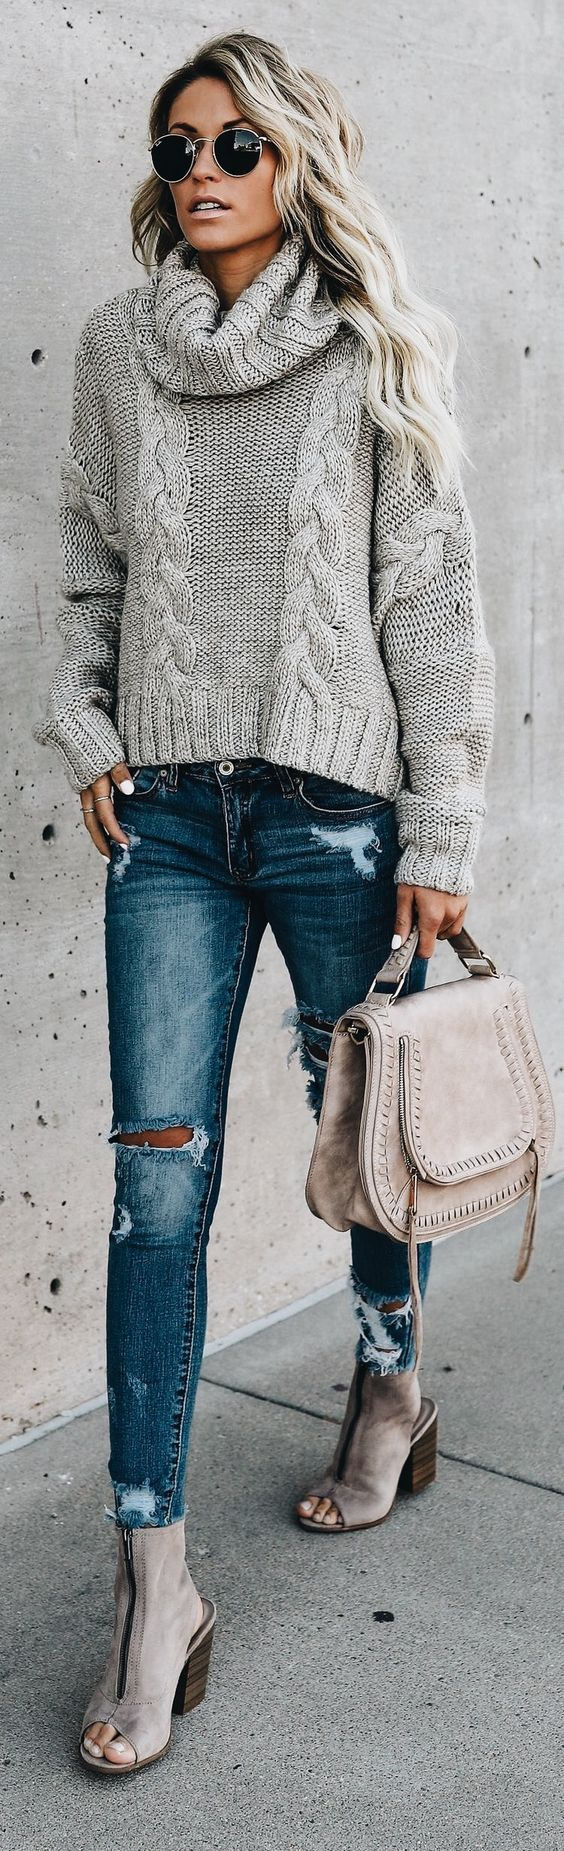 Tendencias Moda Invierno 2019 | BISUTERIA MODA 2019 | Pinterest | Moda Otou00f1o Invierno Tendencia ...